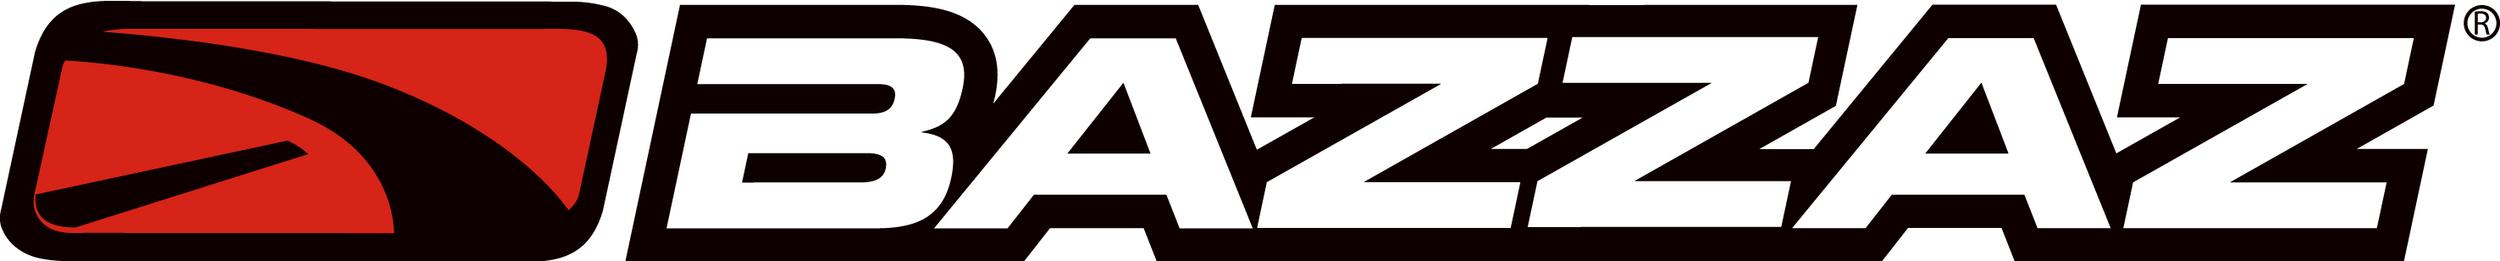 bazzaz-logo-2010.jpg